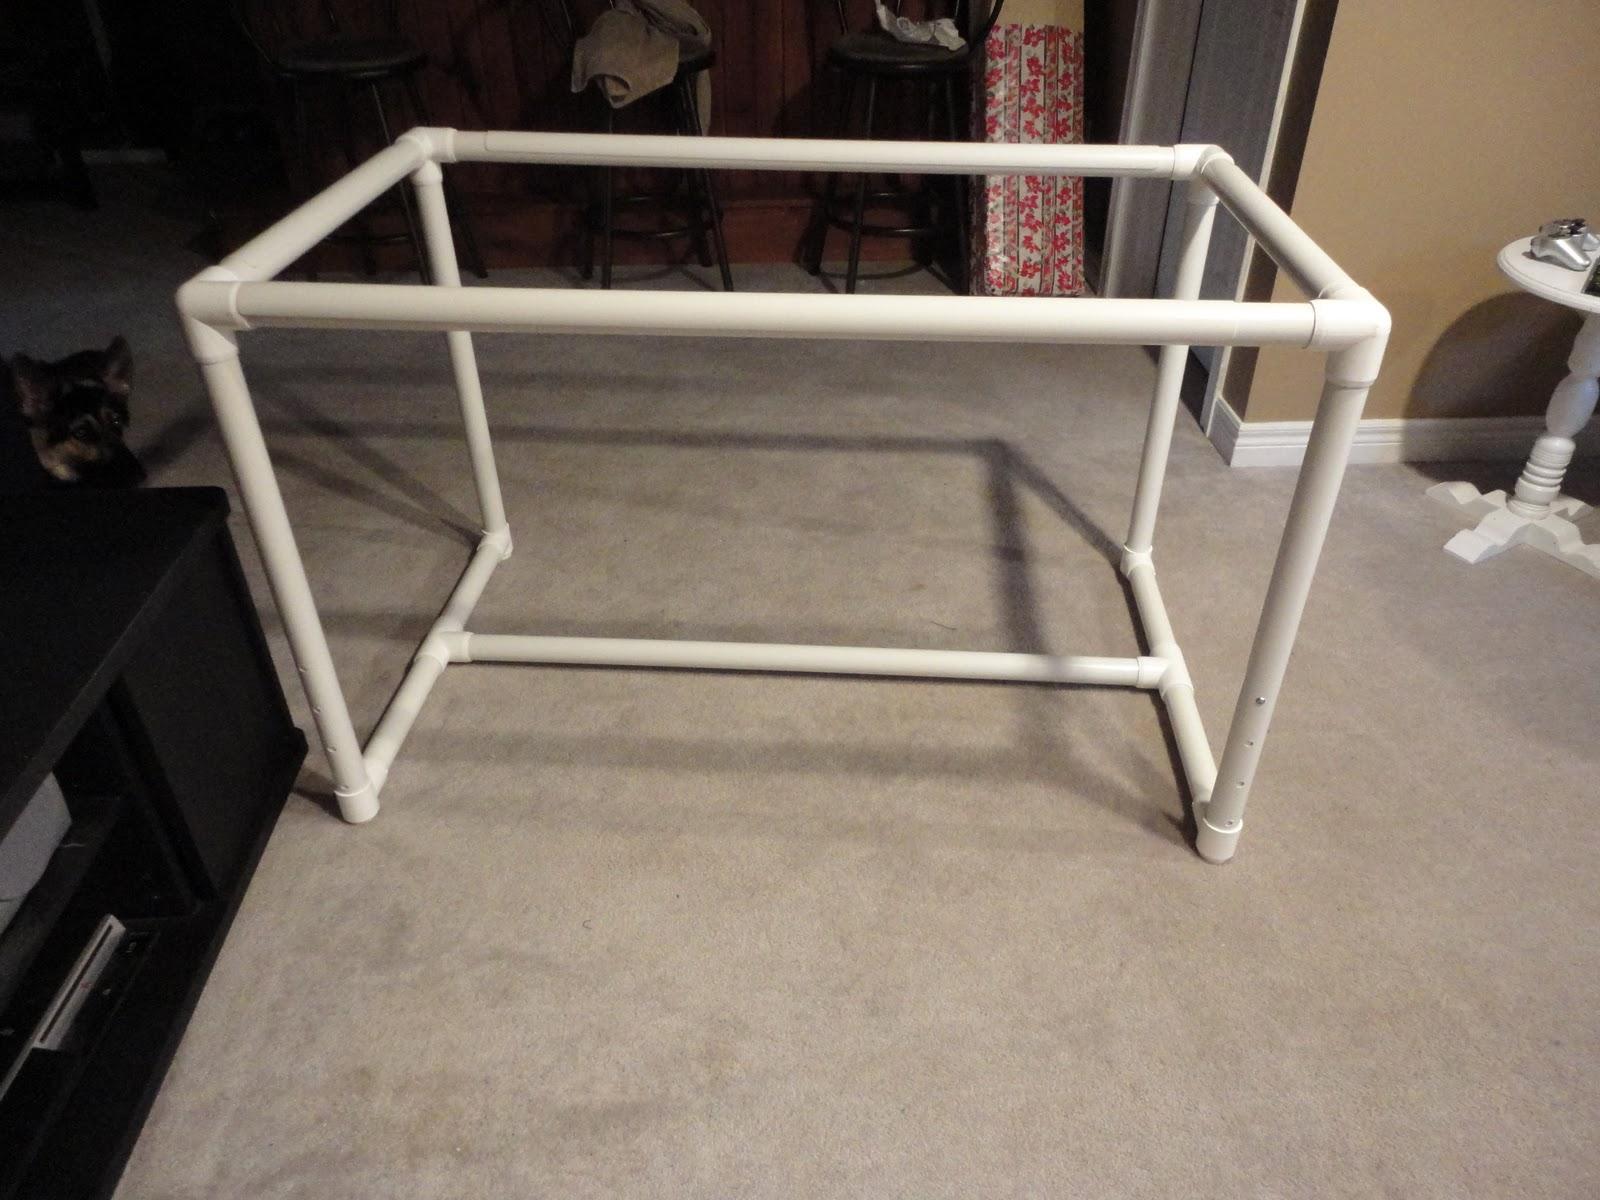 quilting frame after - Diy Quilting Frame